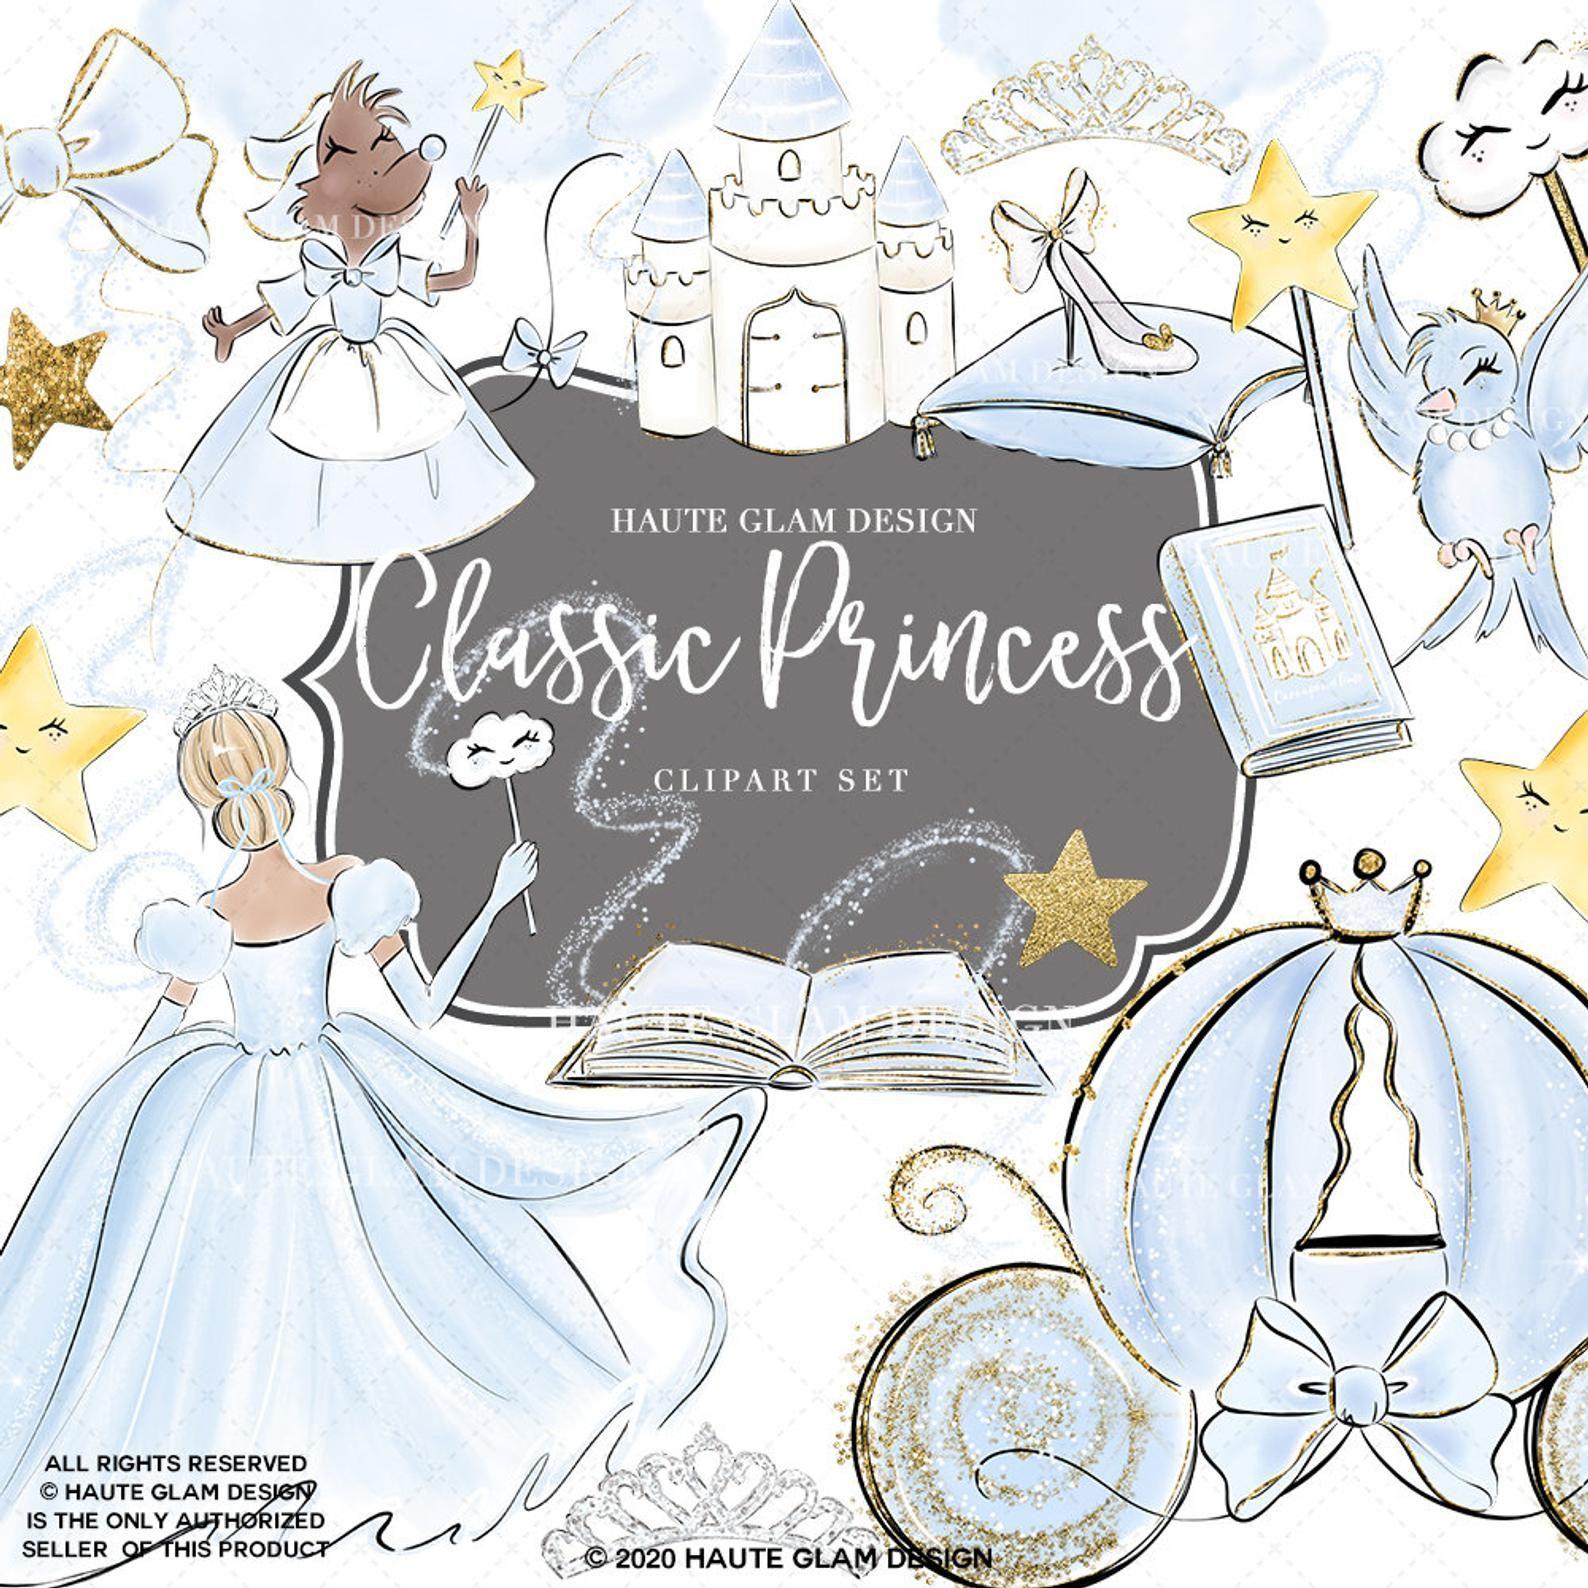 Classic princess clipart set fairytale clipart magical